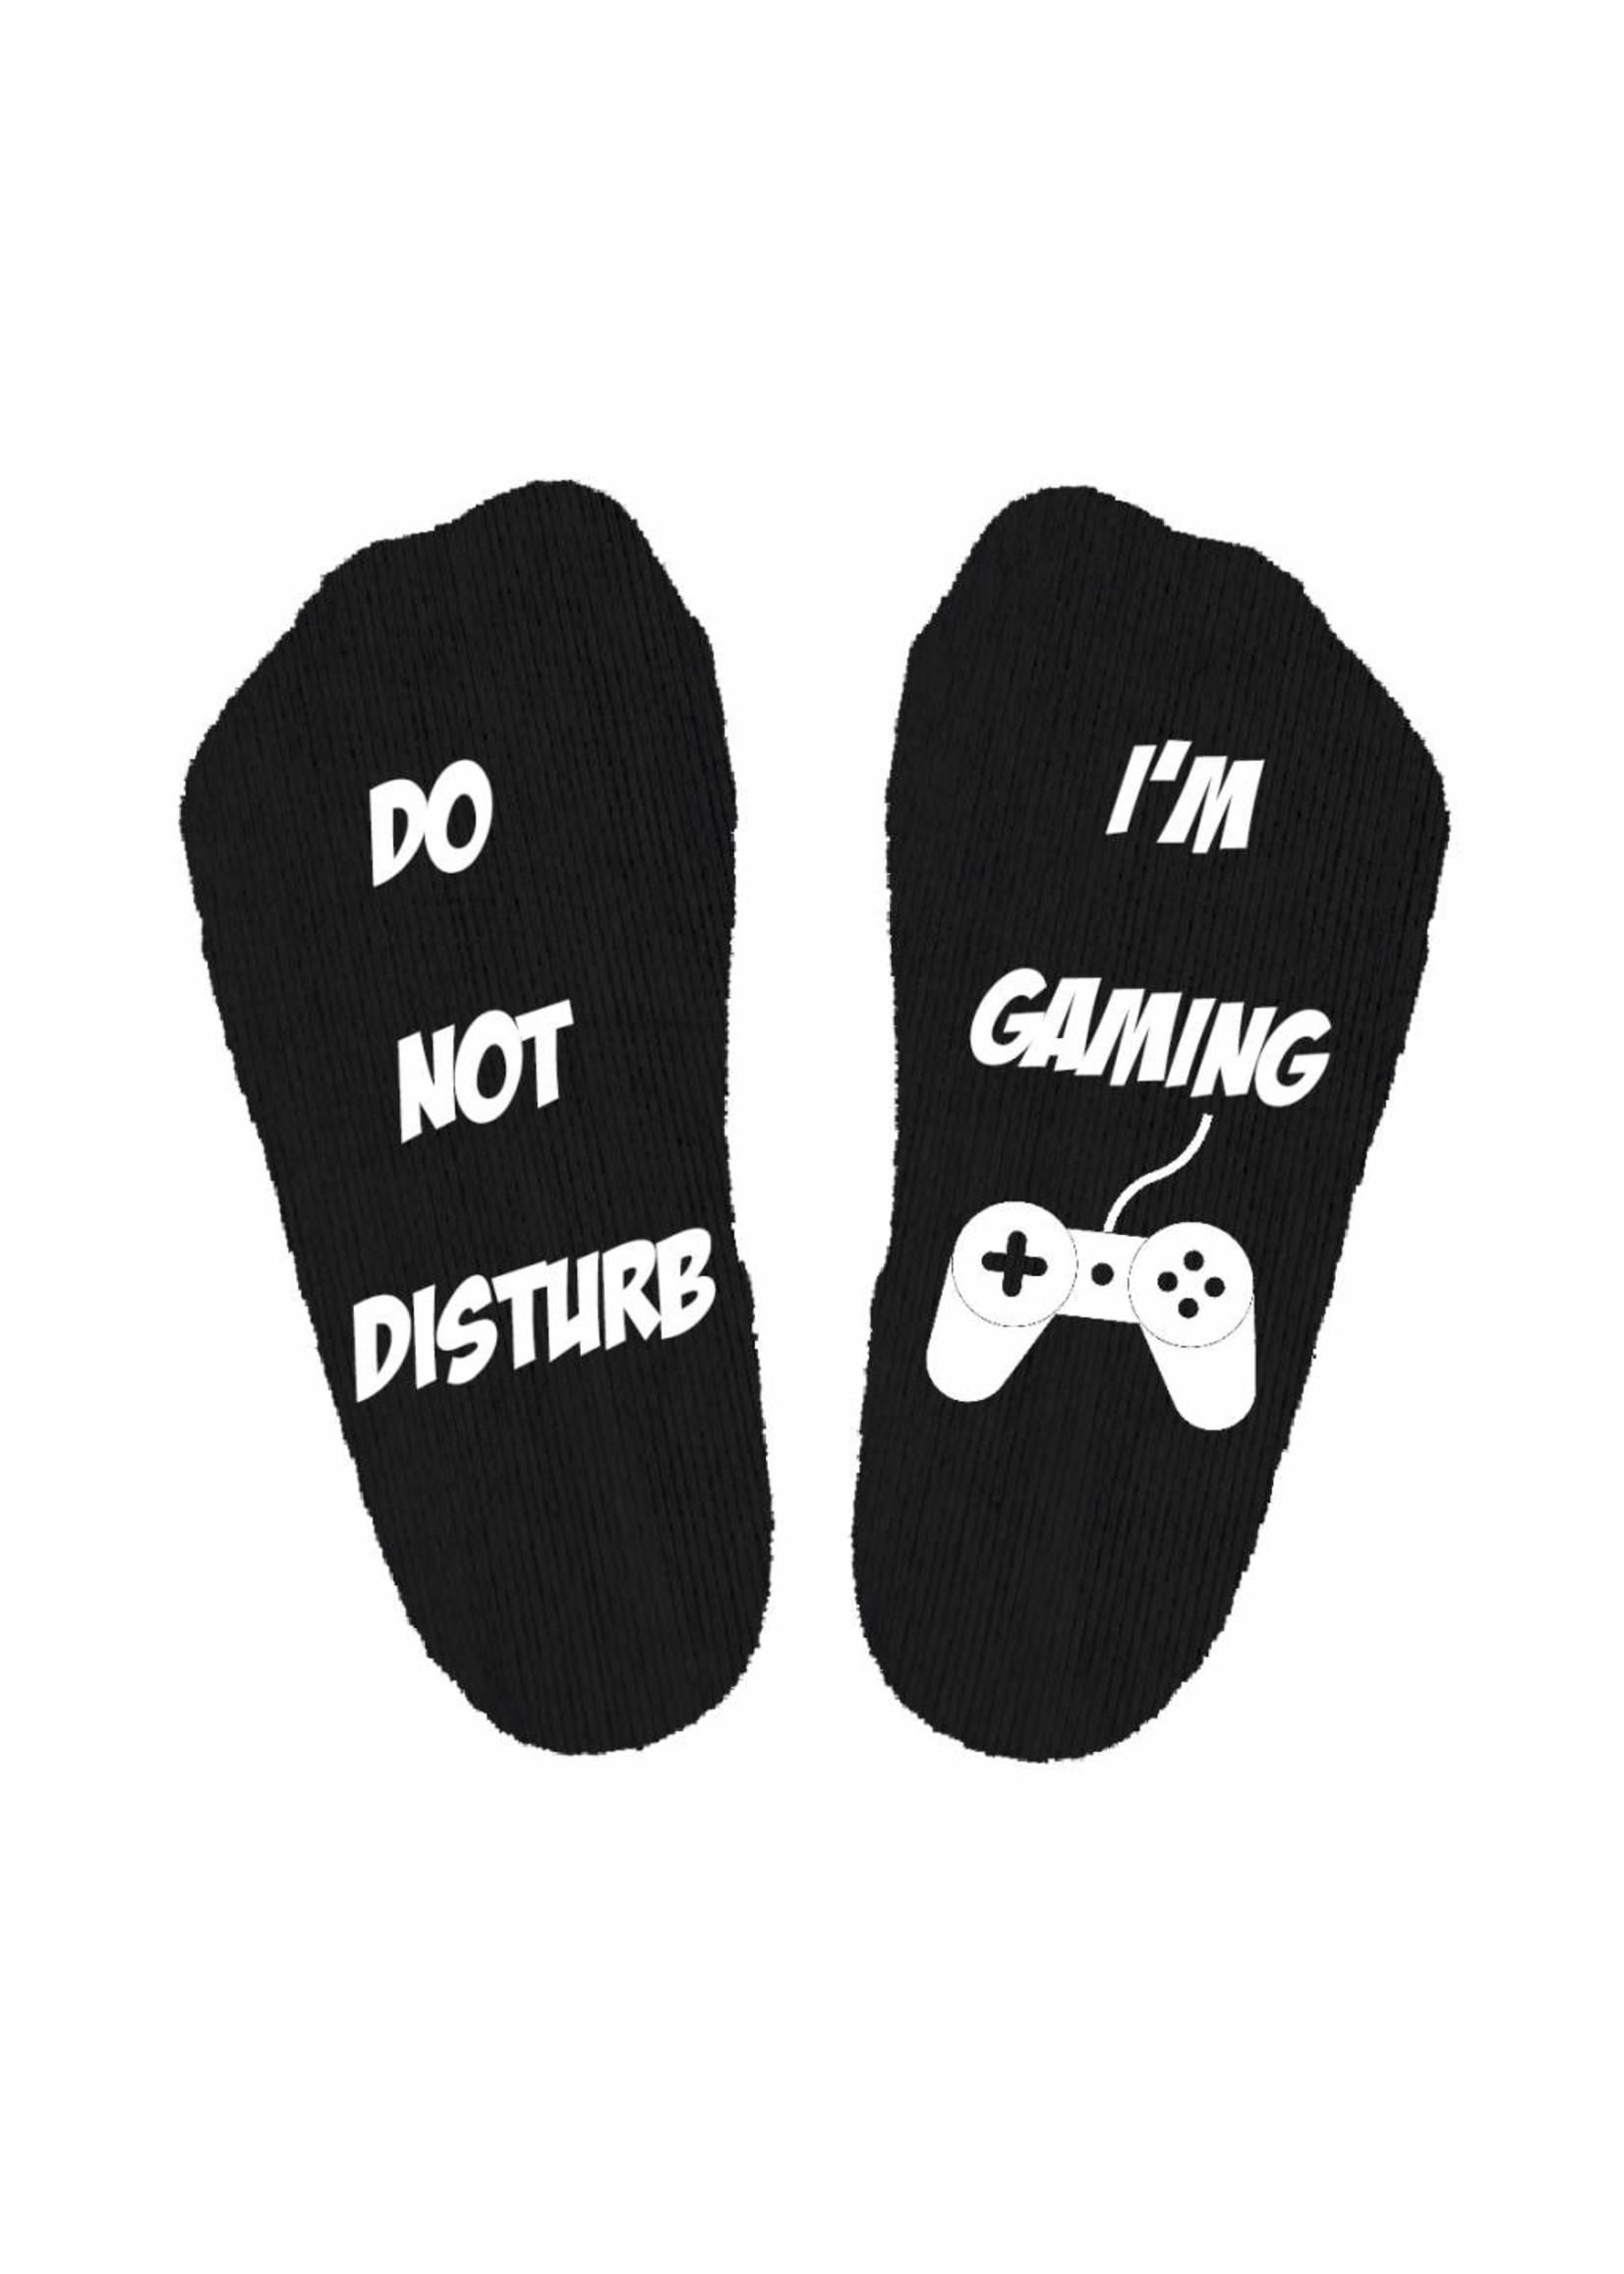 Do not disturb gaming sokken